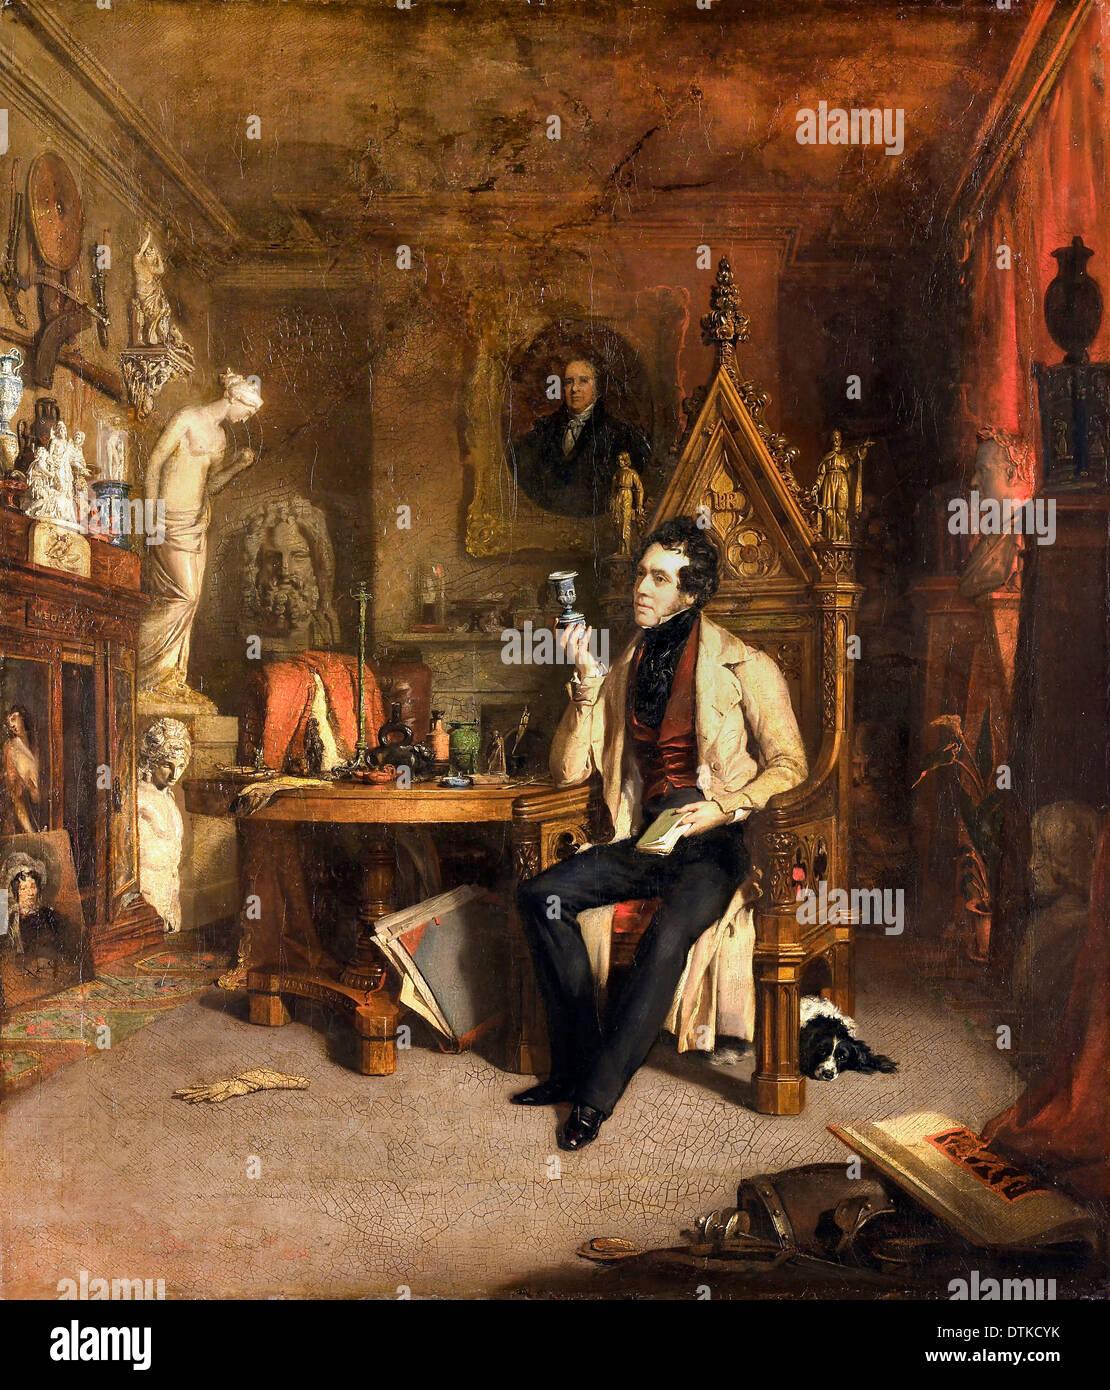 William Daniels, Joseph Mayer 1843 Oil on canvas. Walker Art Gallery, Liverpool, England. Stock Photo